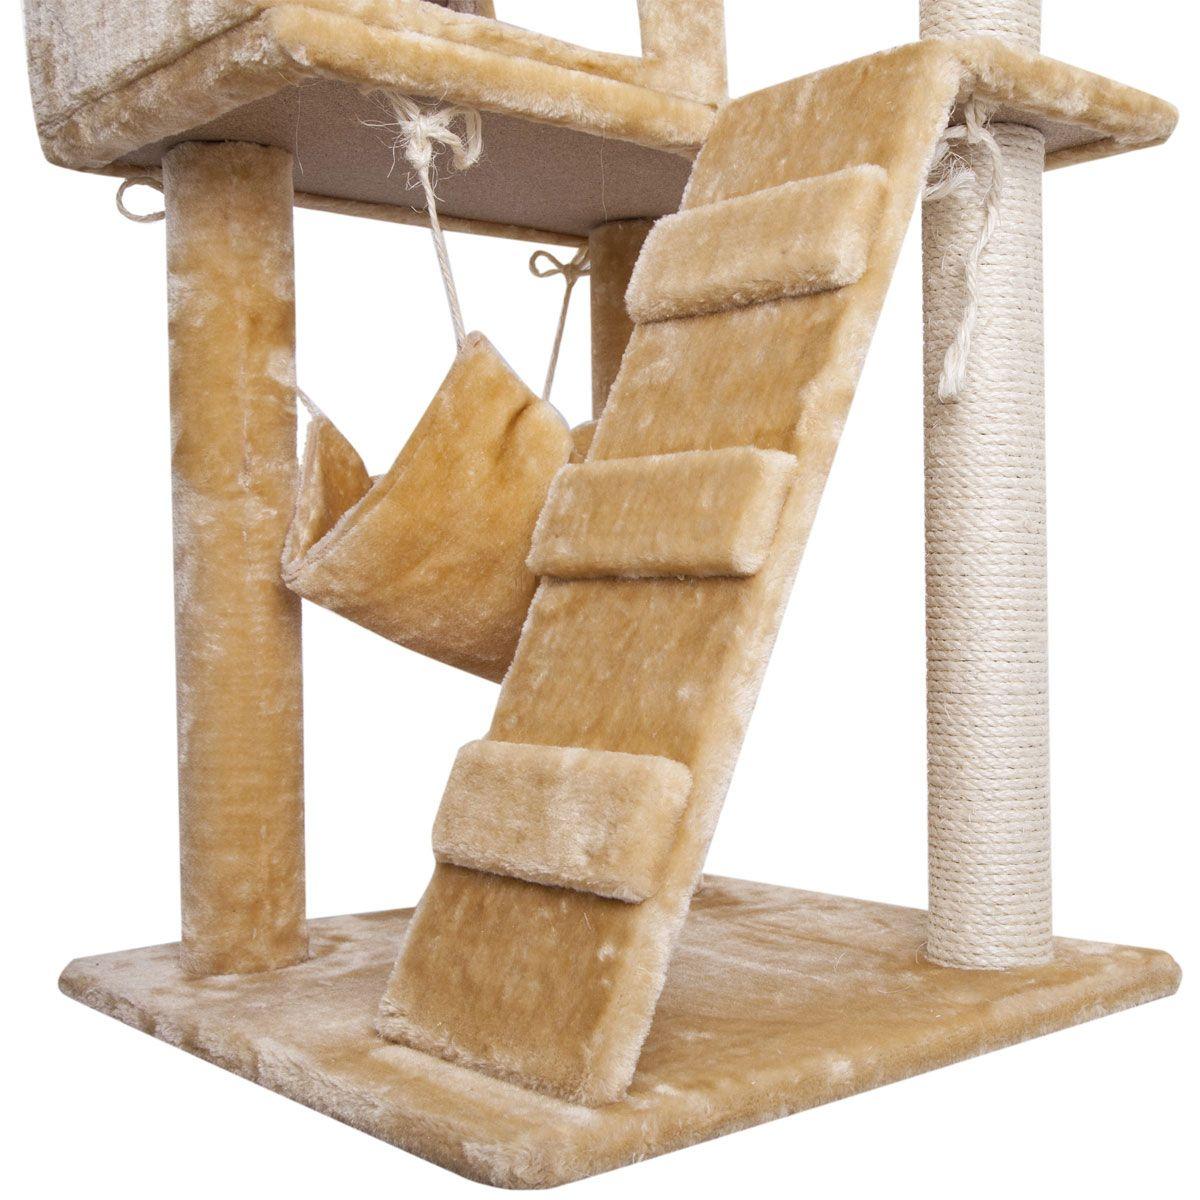 Pix For > Diy Cat Tree House Diy cat tree, Cat furniture